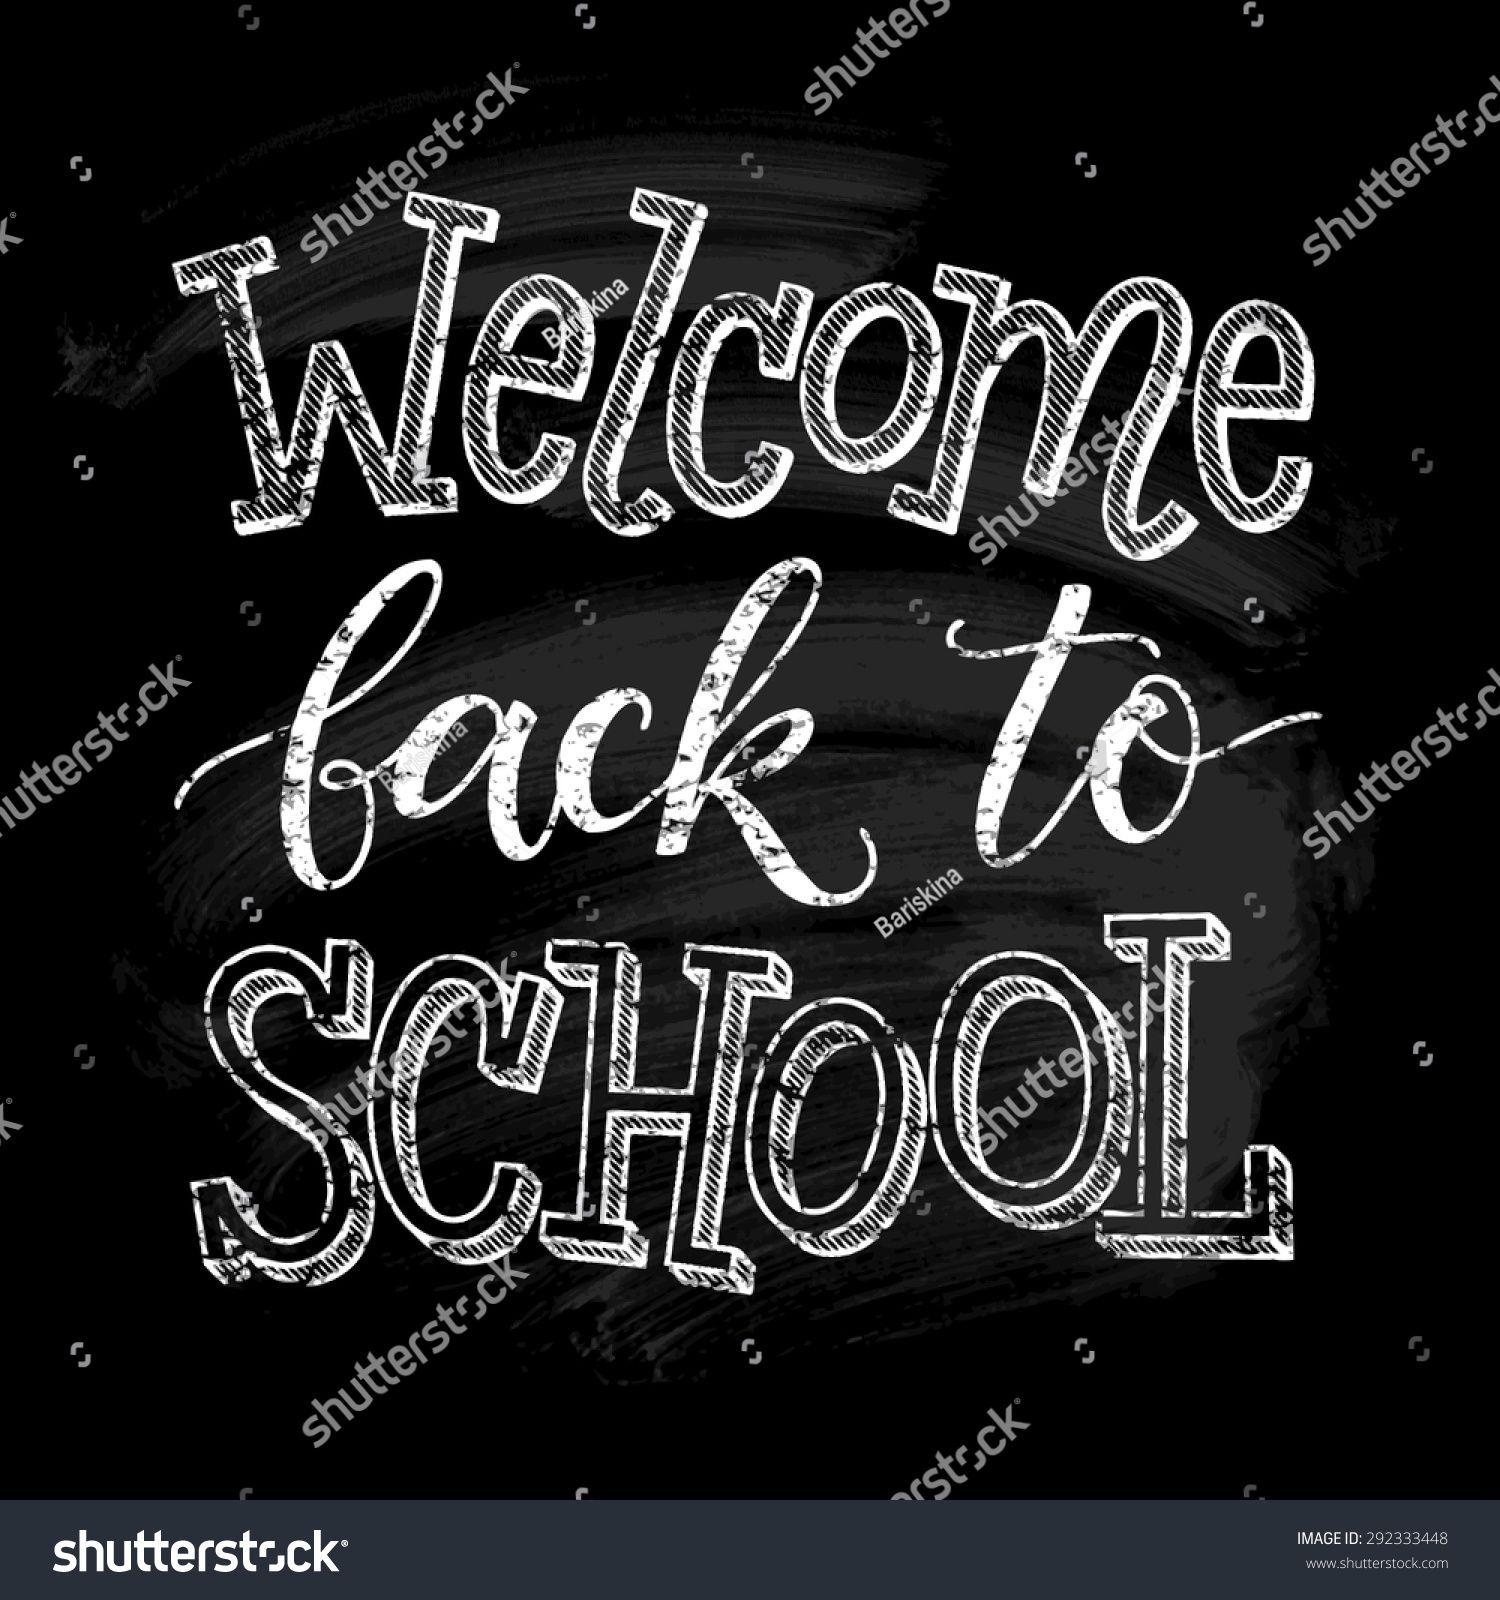 Wel e back to school vector illustration on chalkboard background